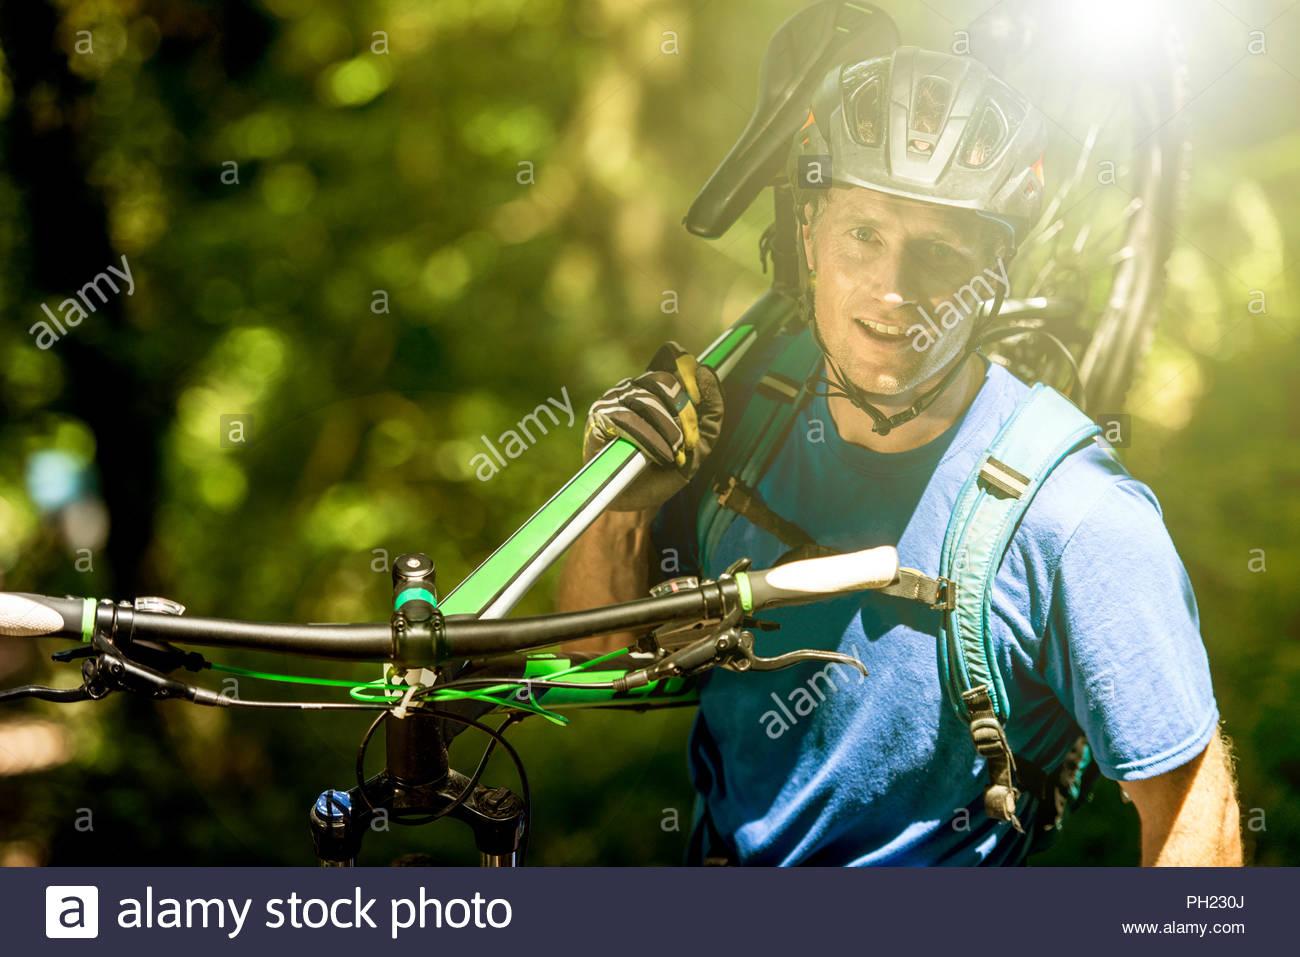 Mann, der Mountainbike im Wald Stockbild